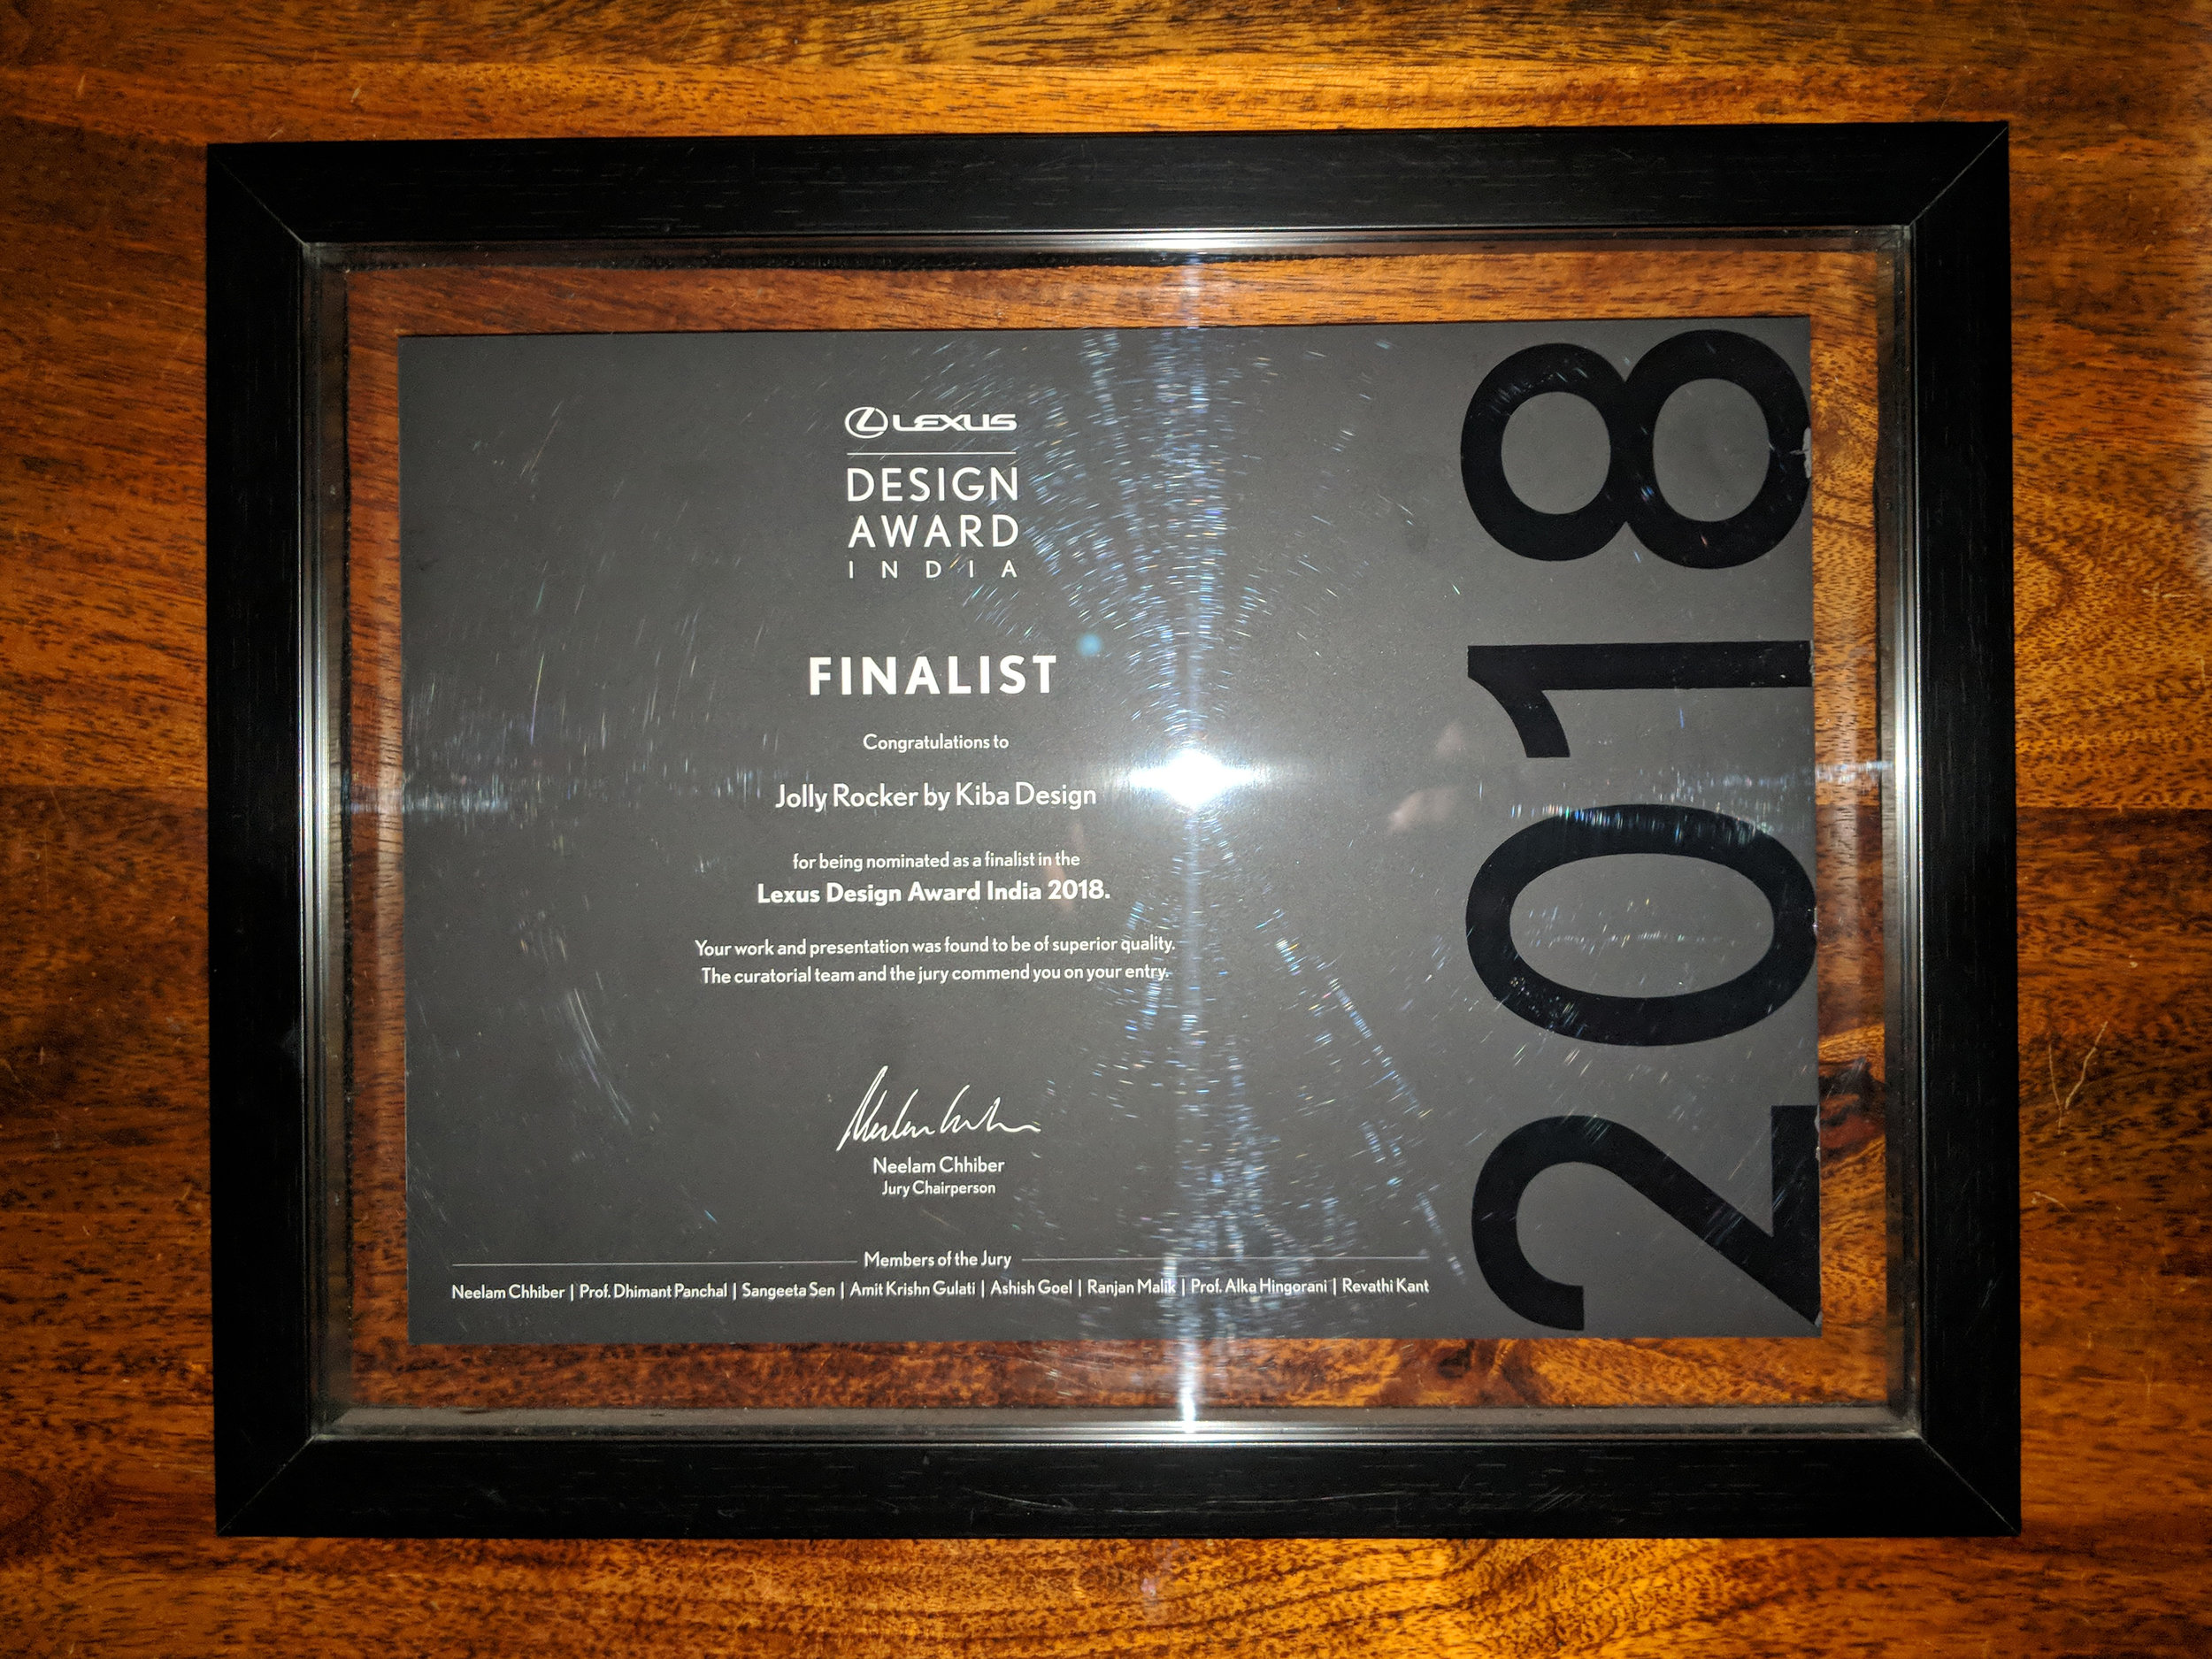 Lexus India Awards 2018 Finalist plaque - Kiba Design